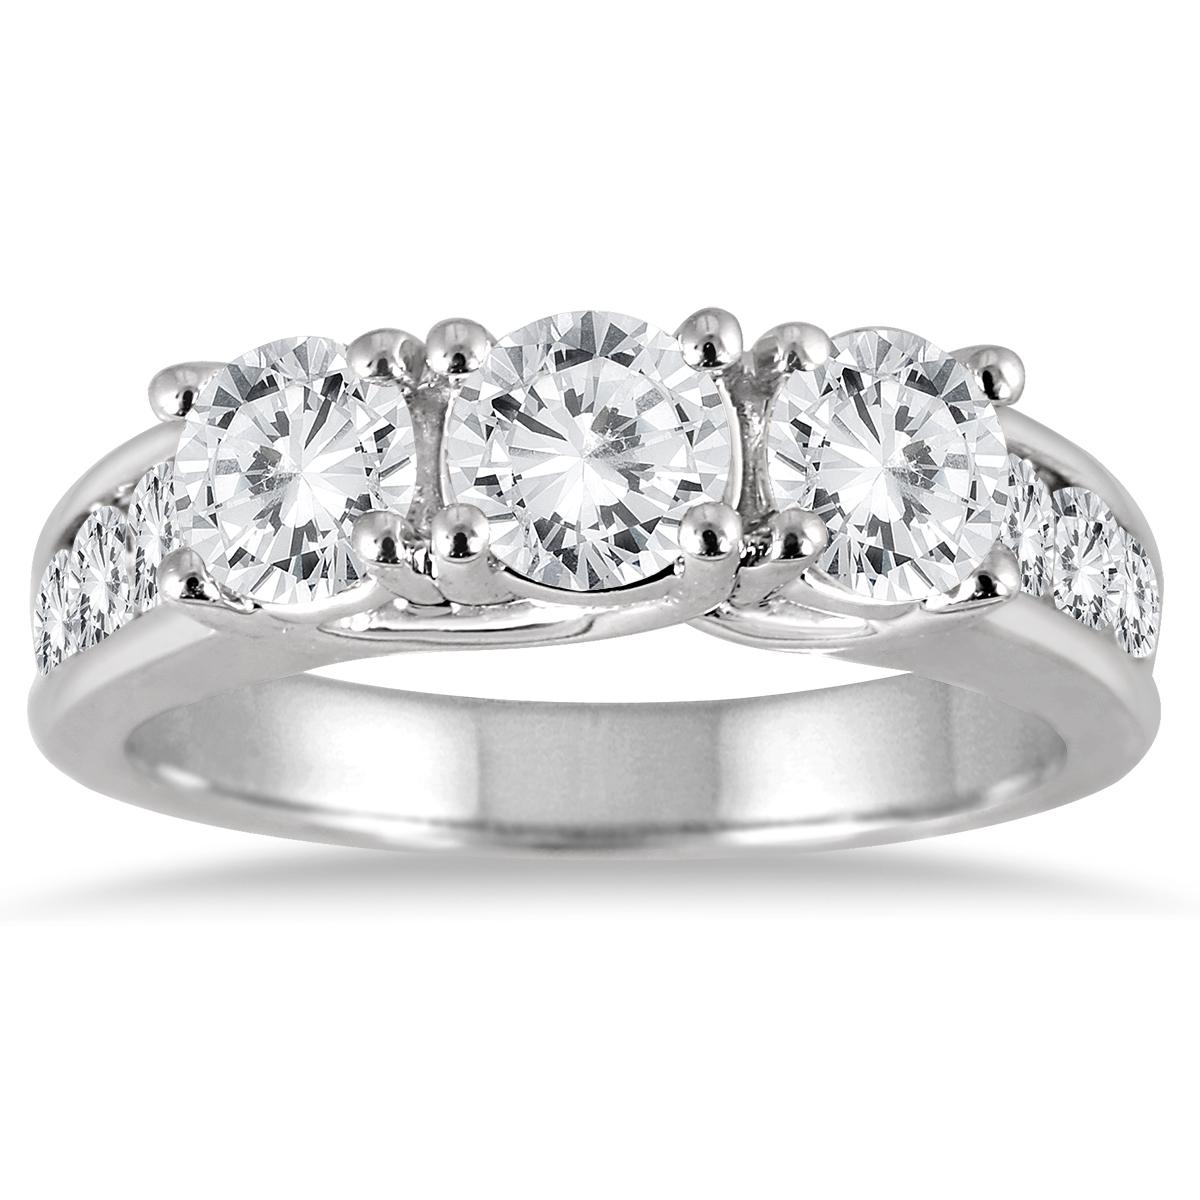 2 Carat TW Diamond Three Stone Ring